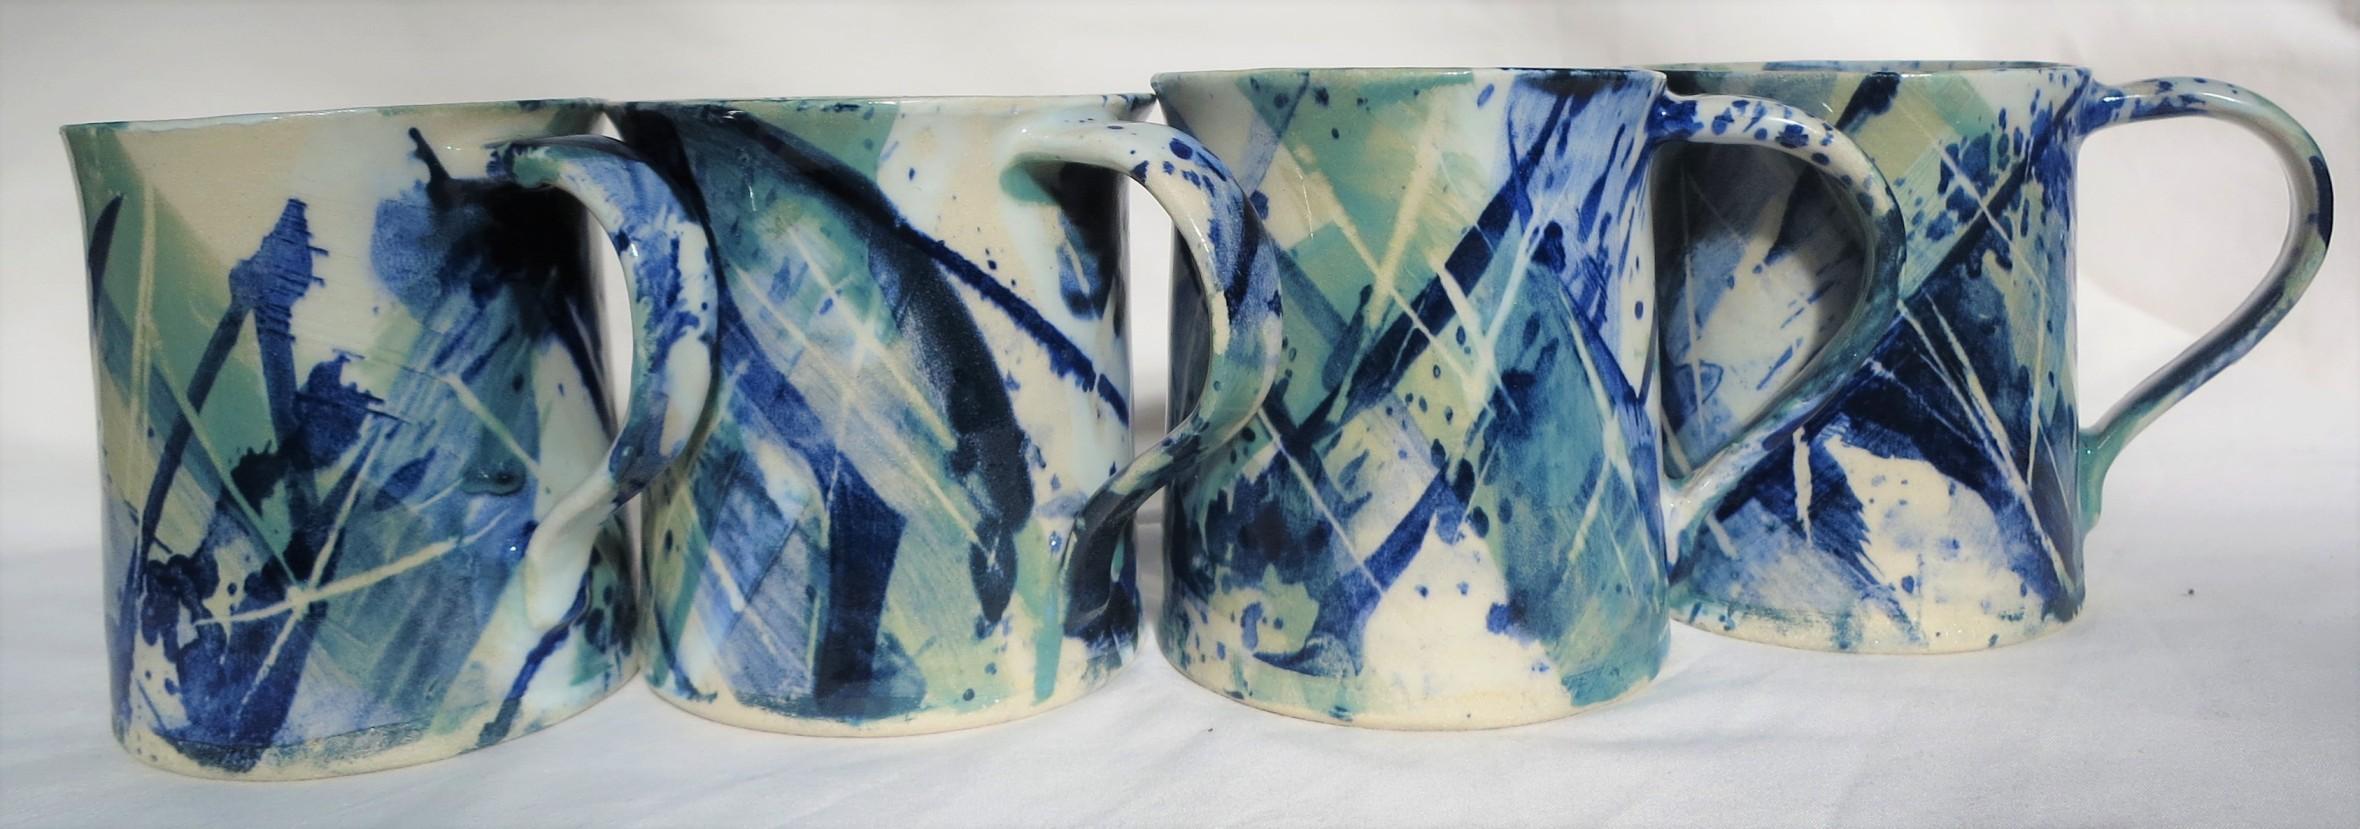 Splash Blue Mugs x 4 (2)